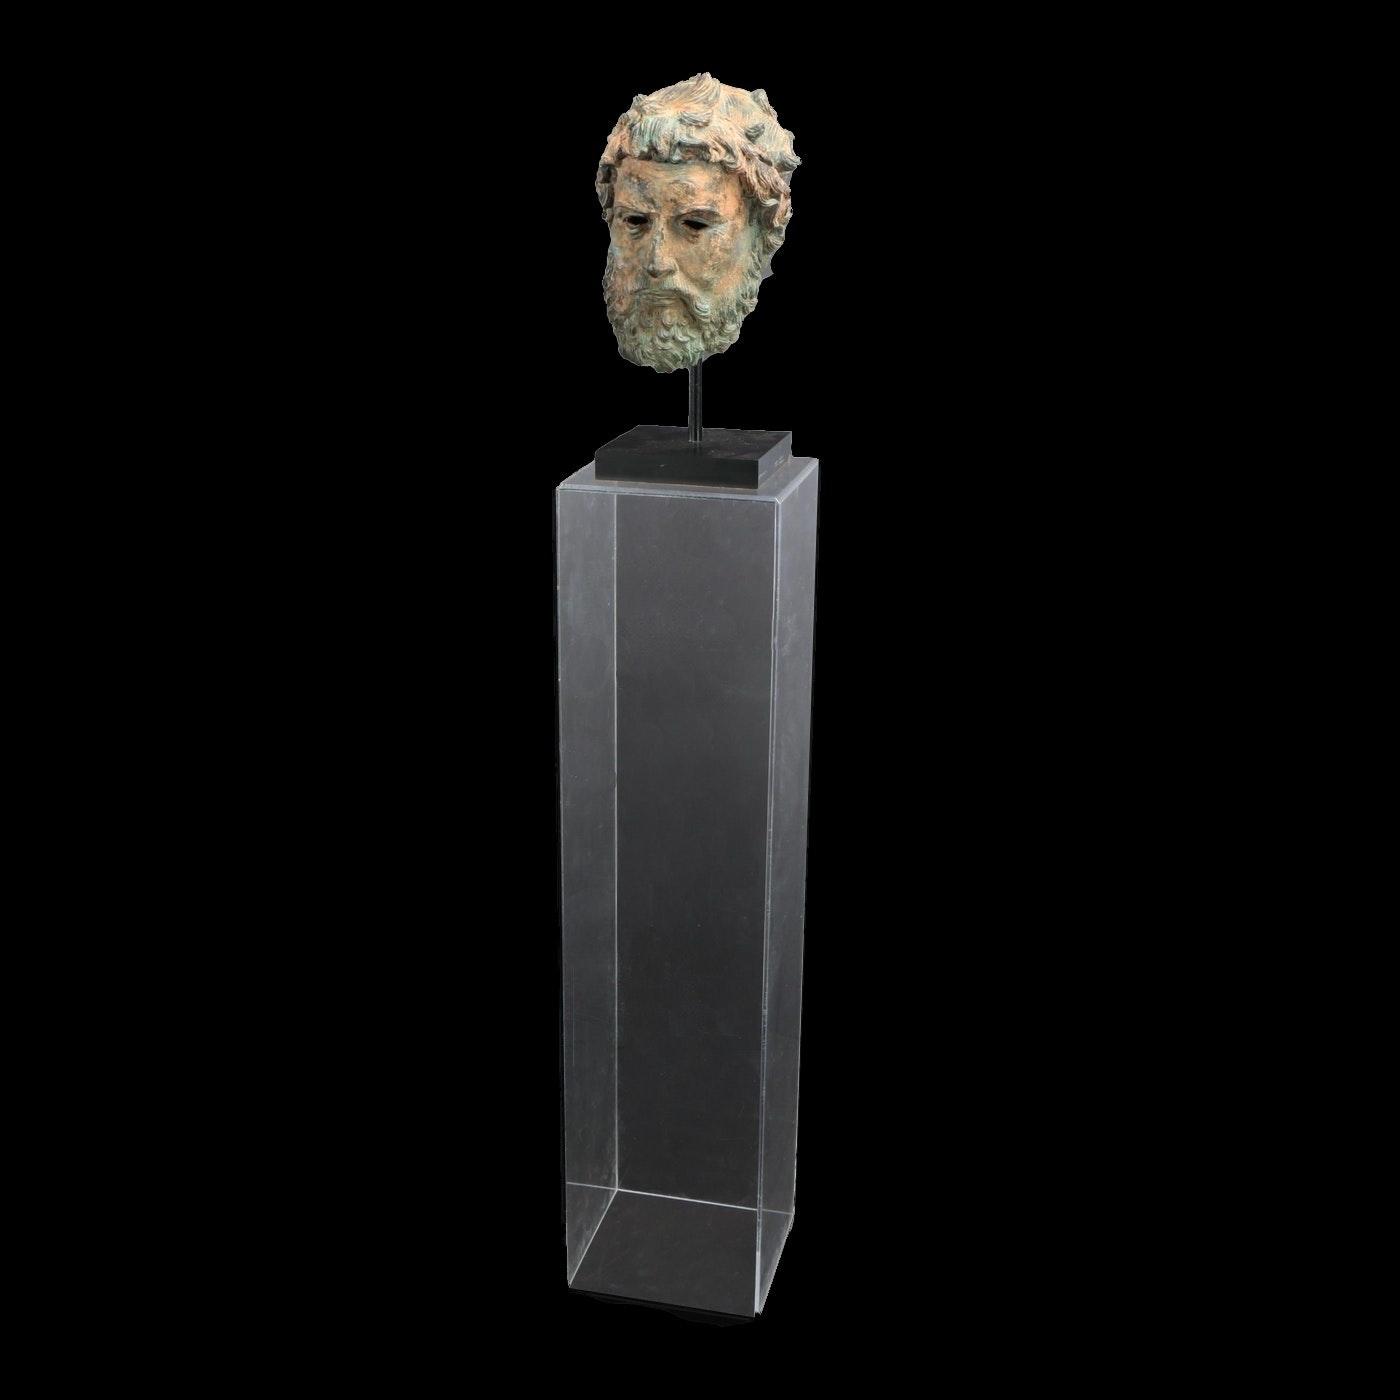 Metal Cast Sculpture of Sophocles